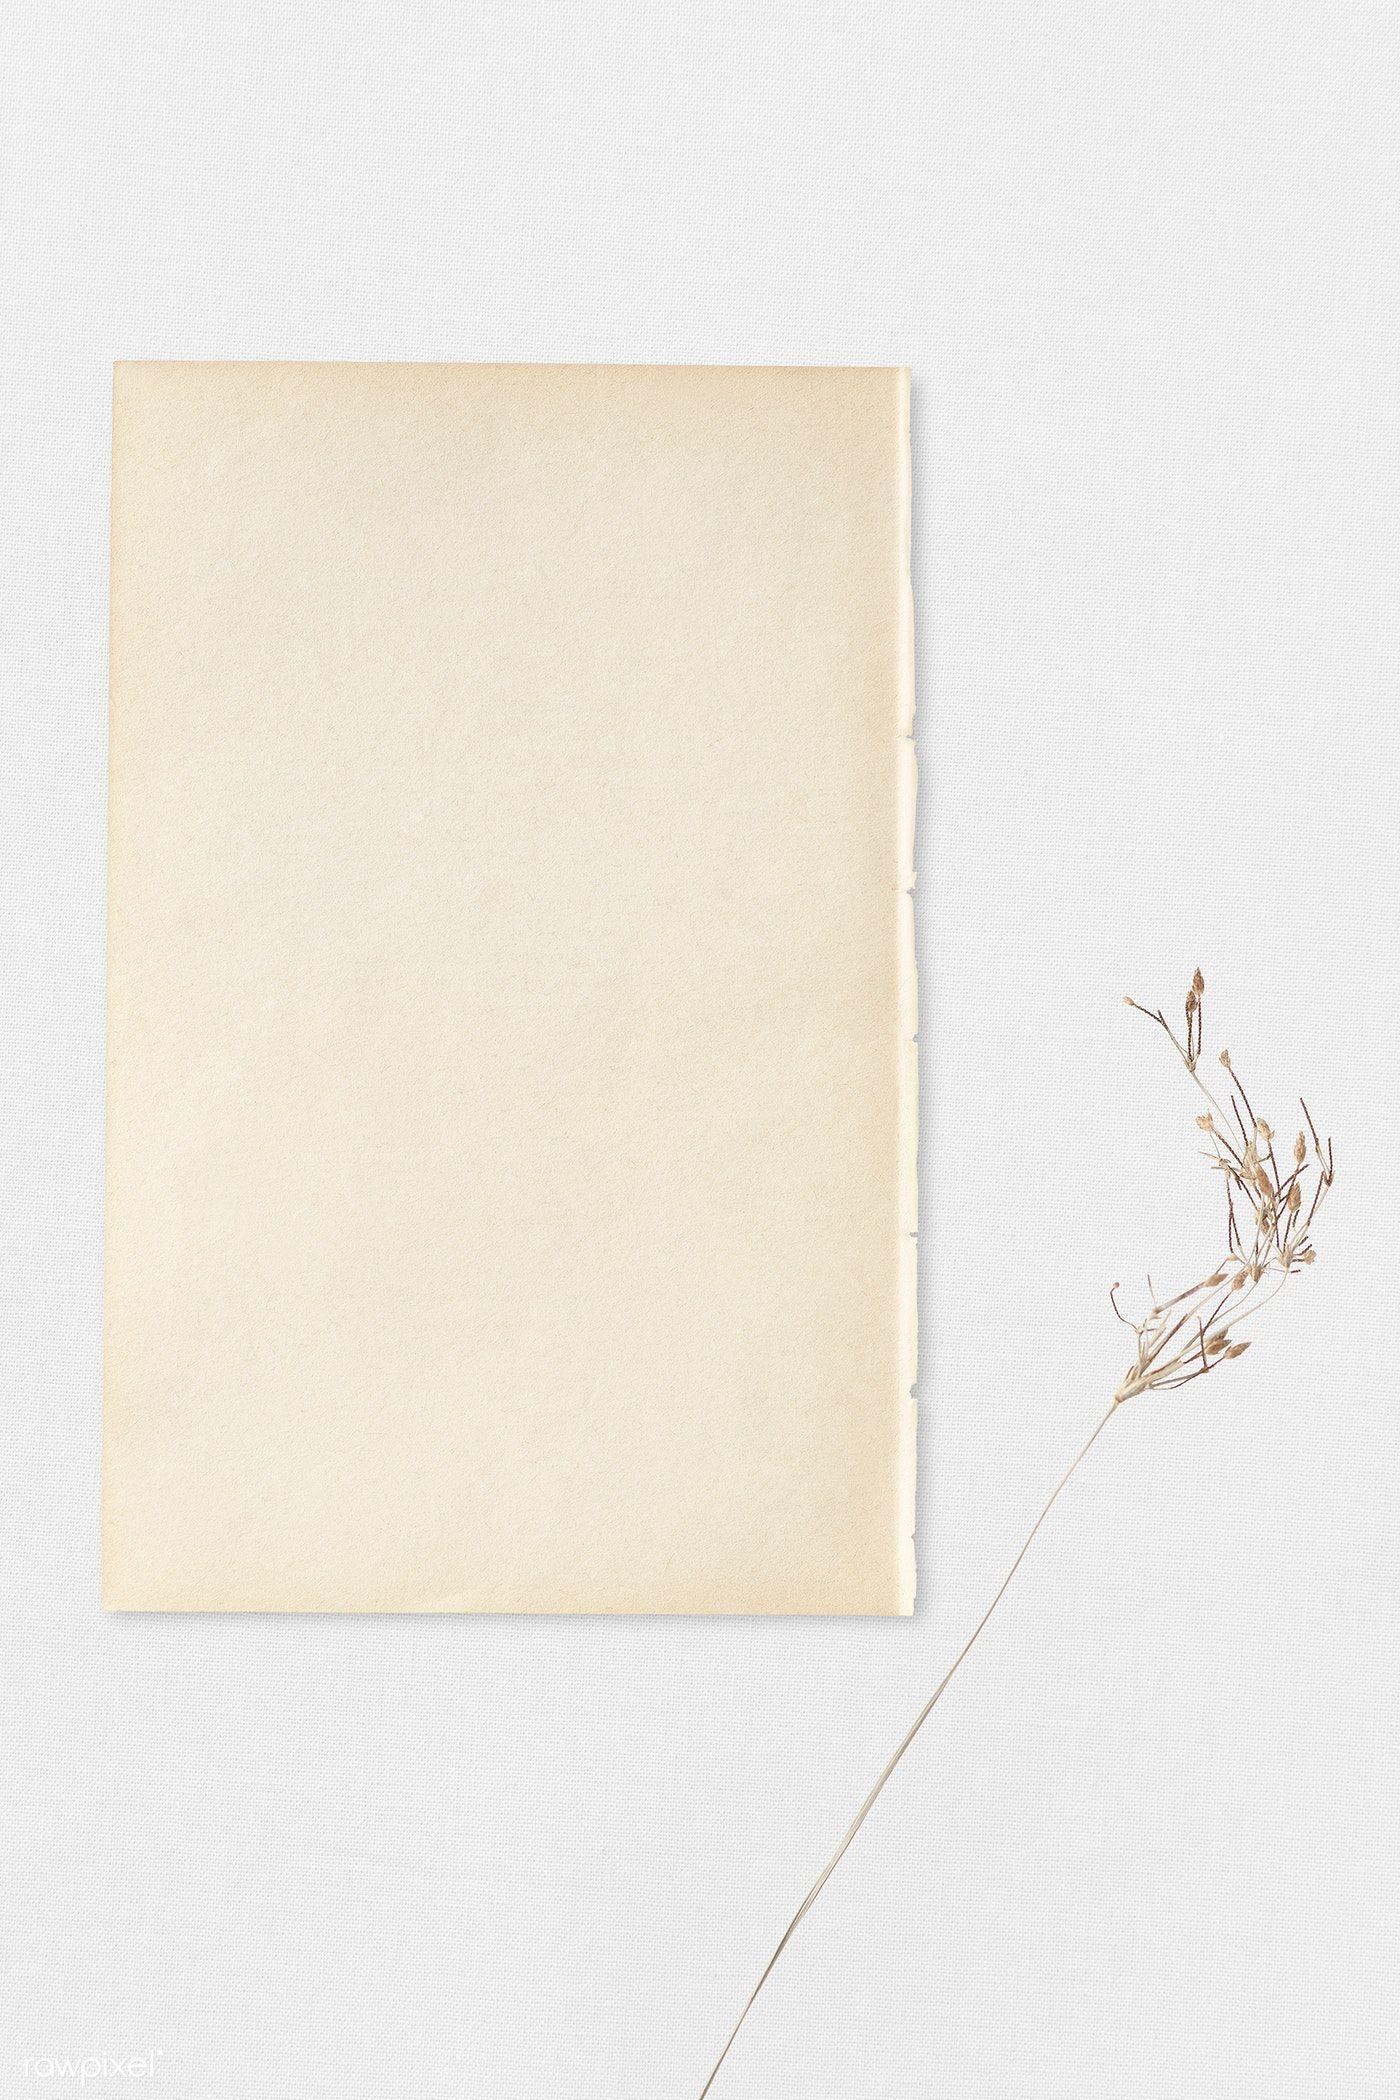 Blank Vintage Craft Paper Template Premium Image By Rawpixel Com Kutthaleeyo Template Vintagedesig Vintage Paper Template Paper Template Vintage Template